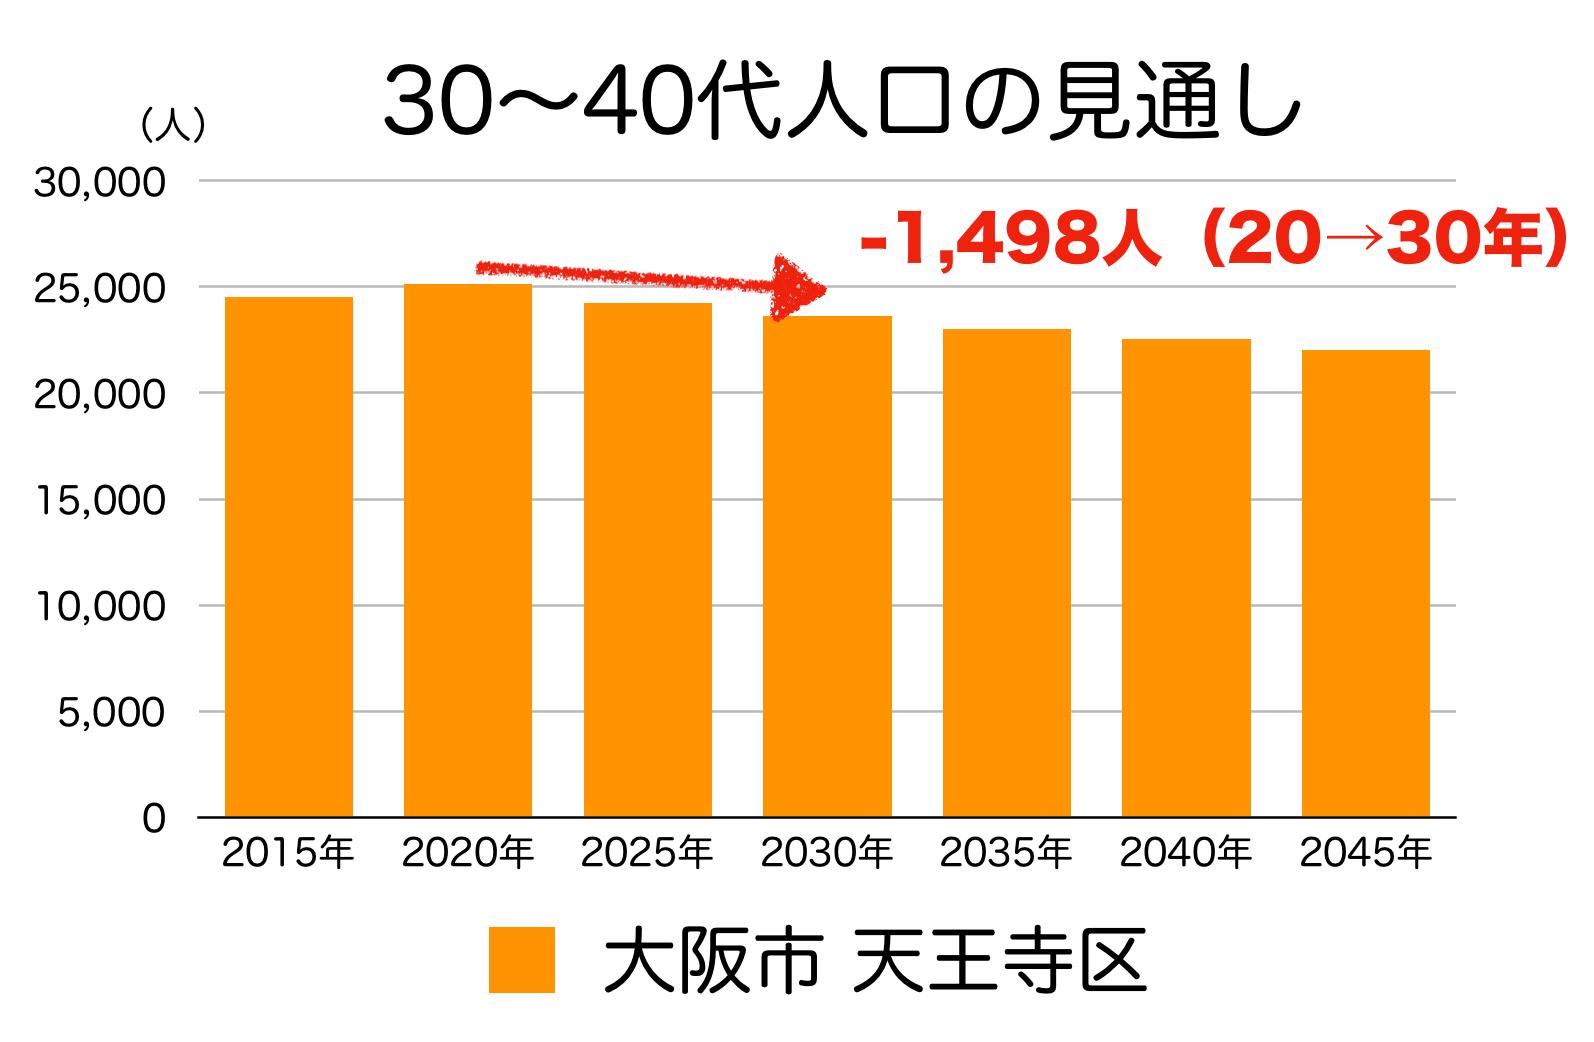 大阪市天王寺区の30〜40代人口の予測